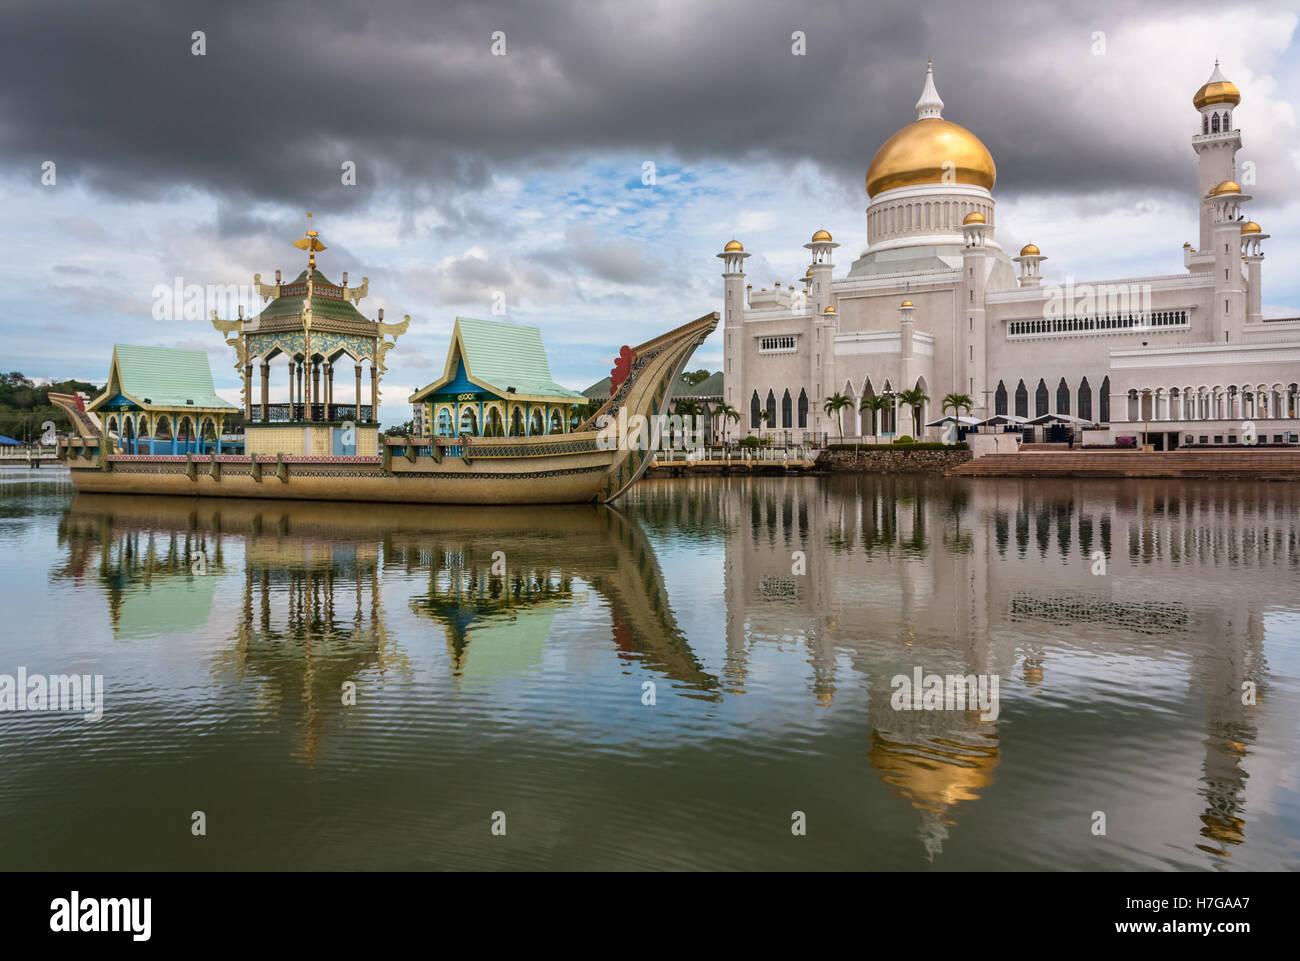 Sultan Omar Ali Saifuddin Mosque, Bandar Seri Begawan, Brunei, Southeast Asia - Stock Image